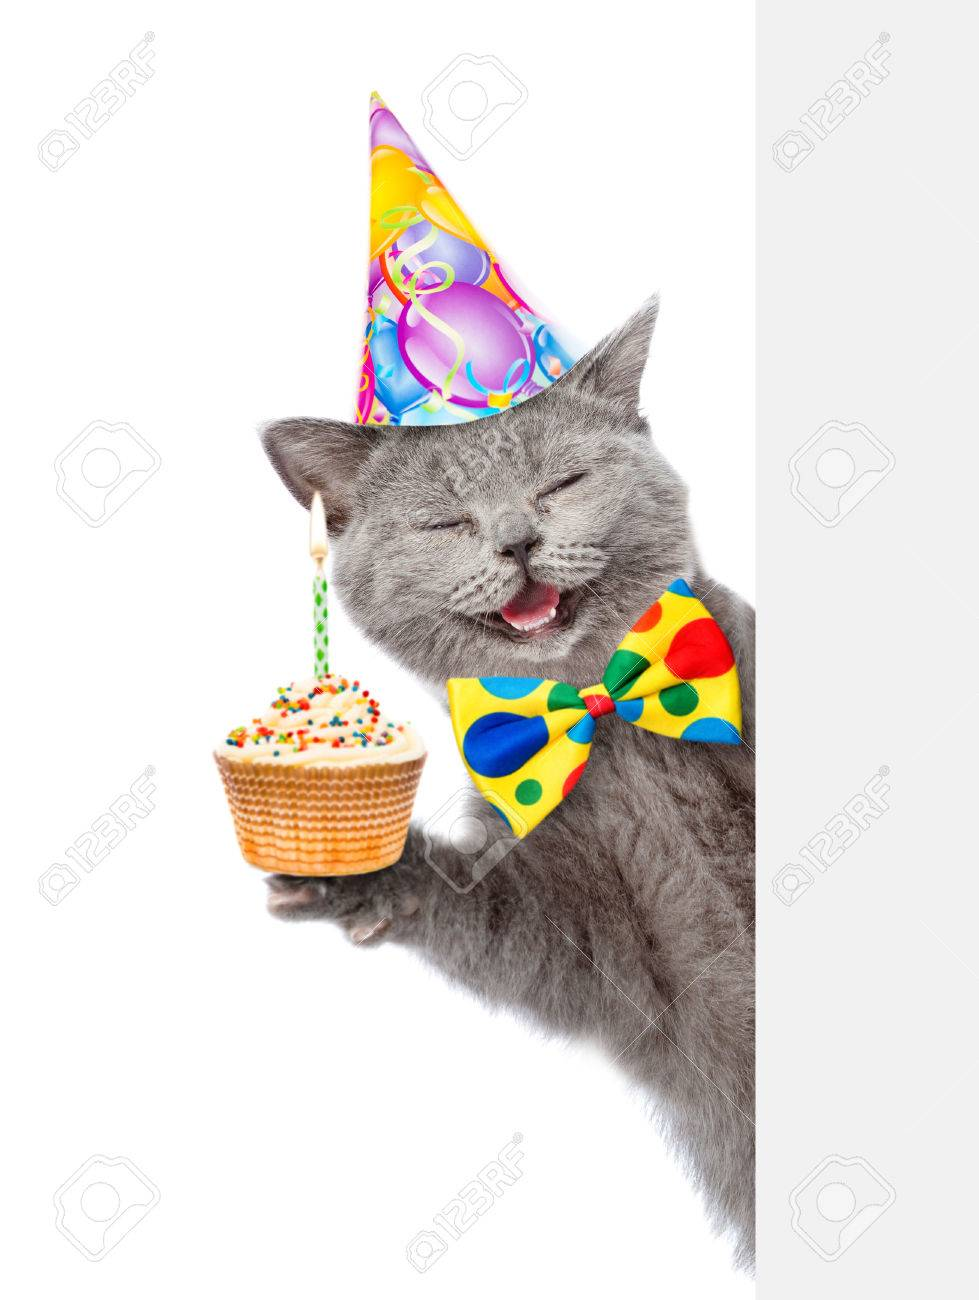 Gelukkig Kat In Verjaardag Hoed Met Cupcake Die Een Aanwijs Stok En